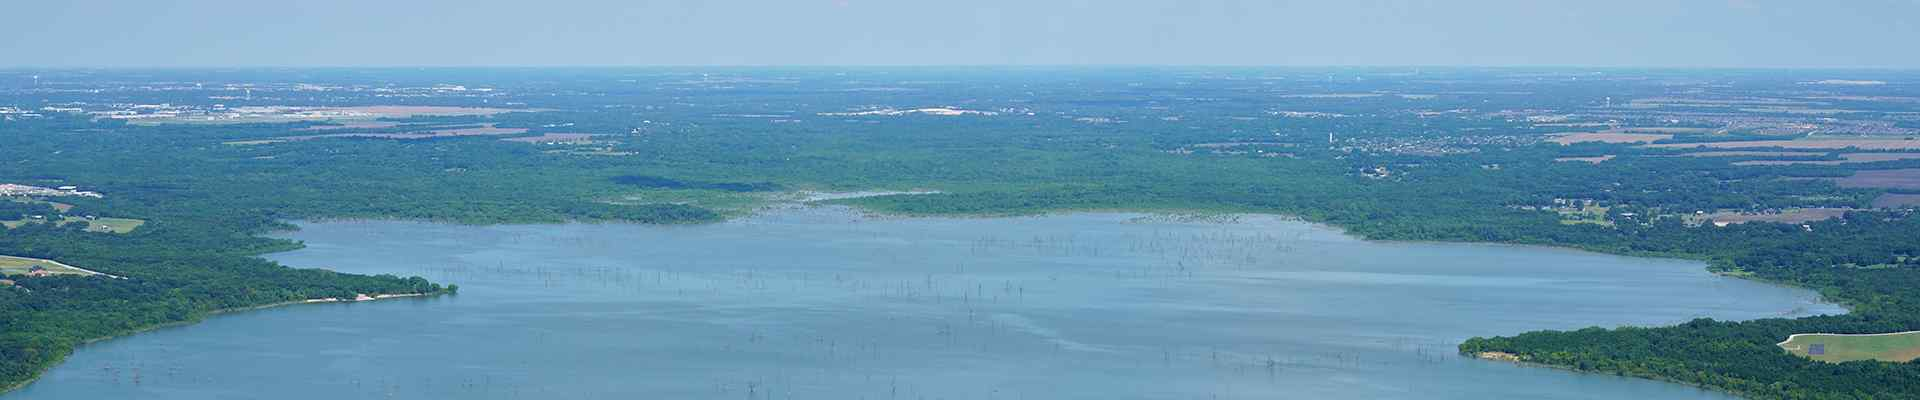 skyline view of lucas texas